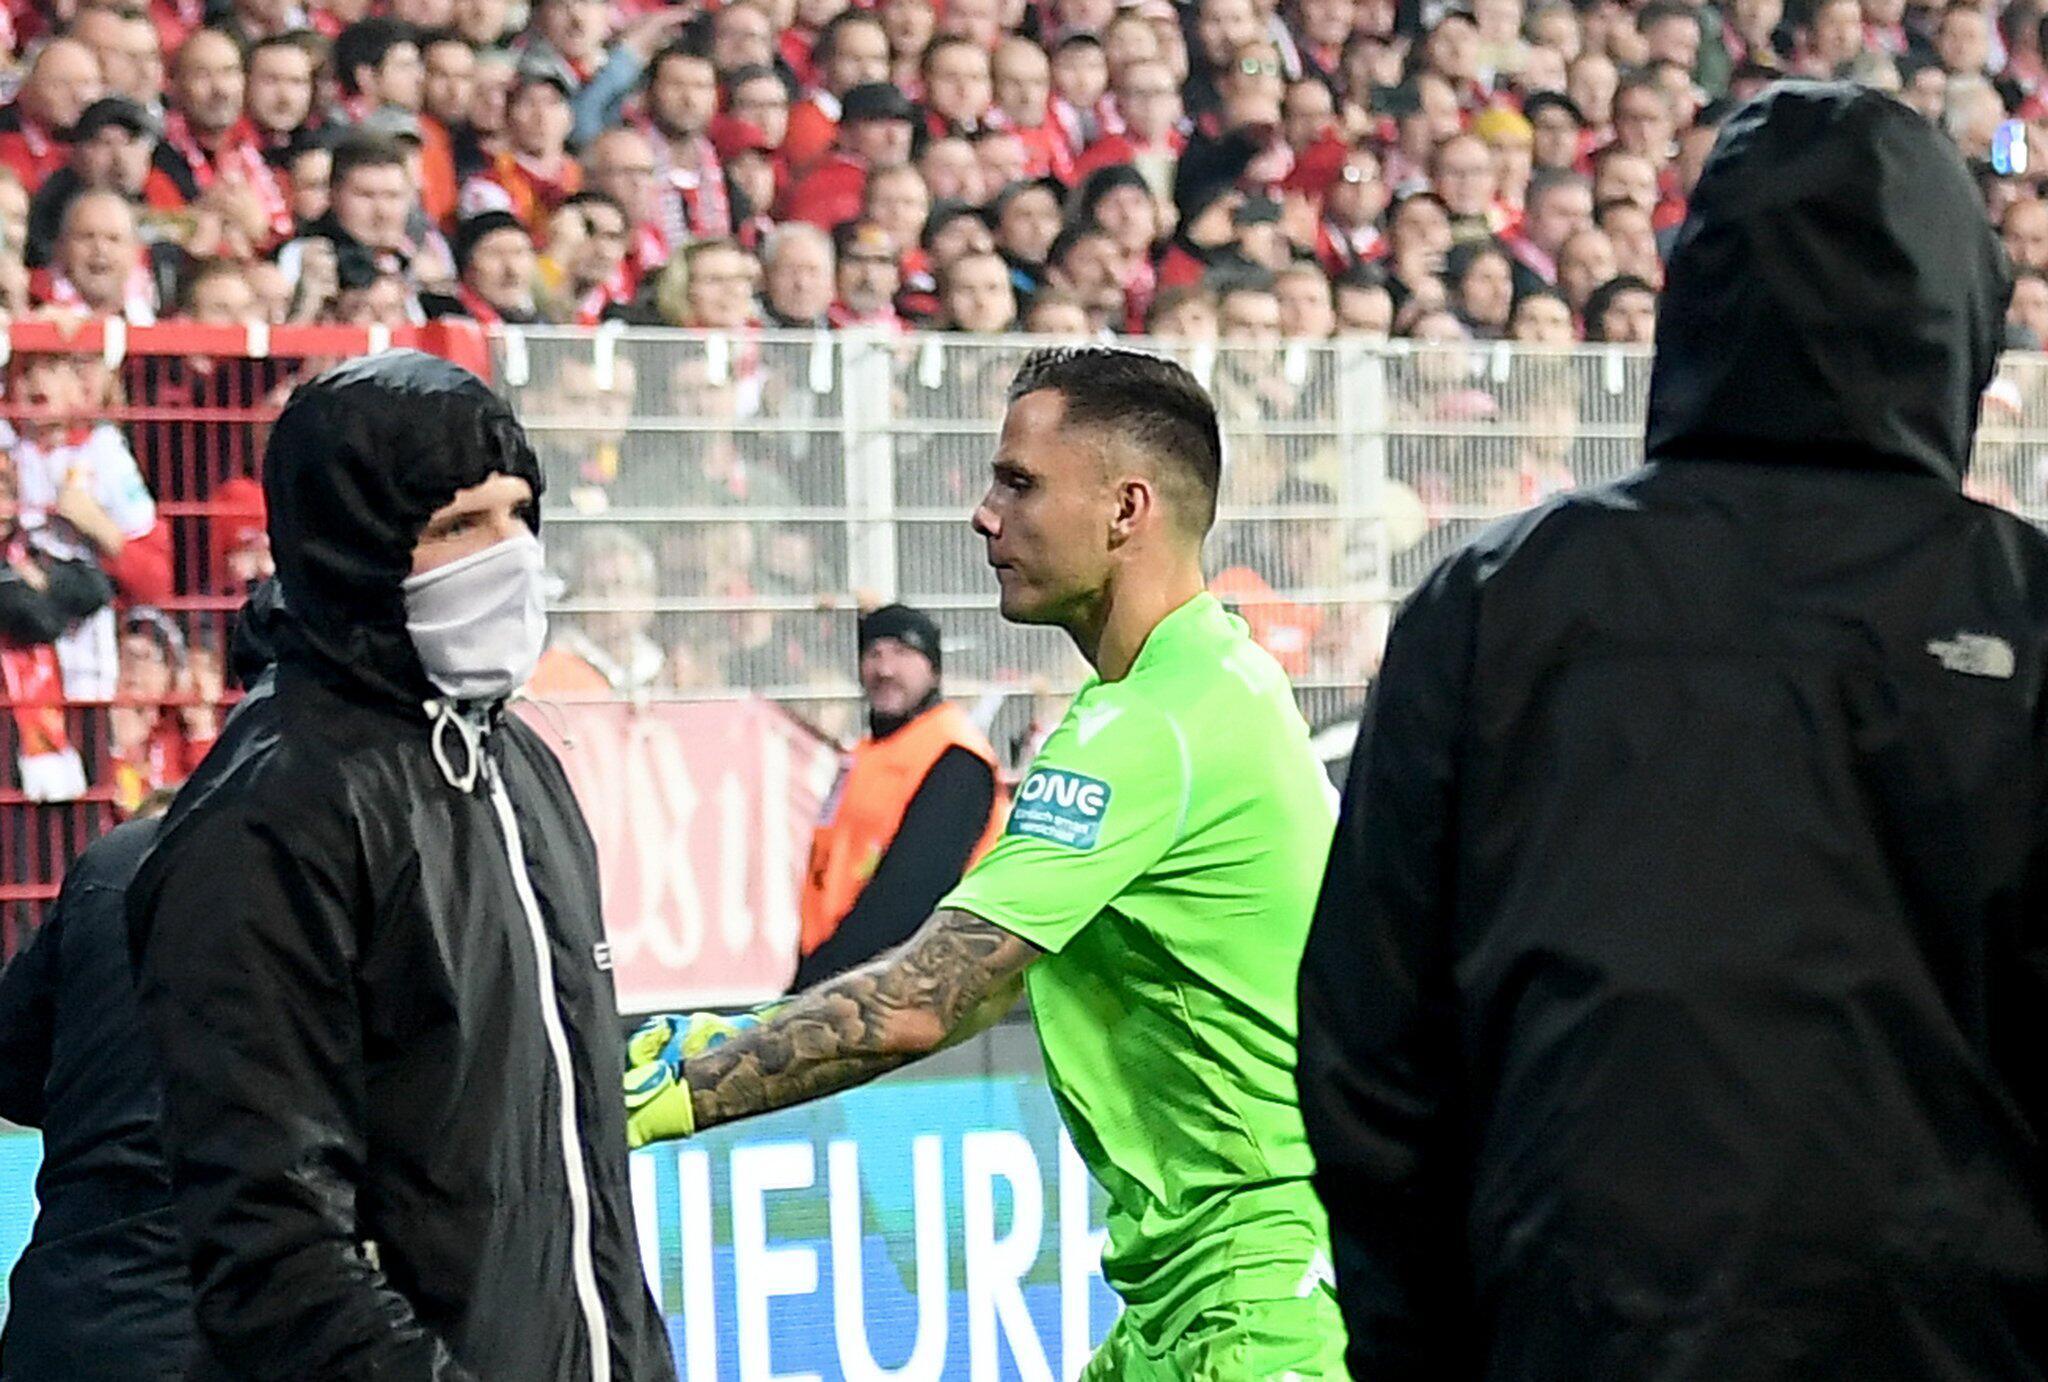 Bild zu 1. FC Union Berlin, Hertha BSC, Rafal Gikiewicz, Chaoten, Ultras, Bundesliga